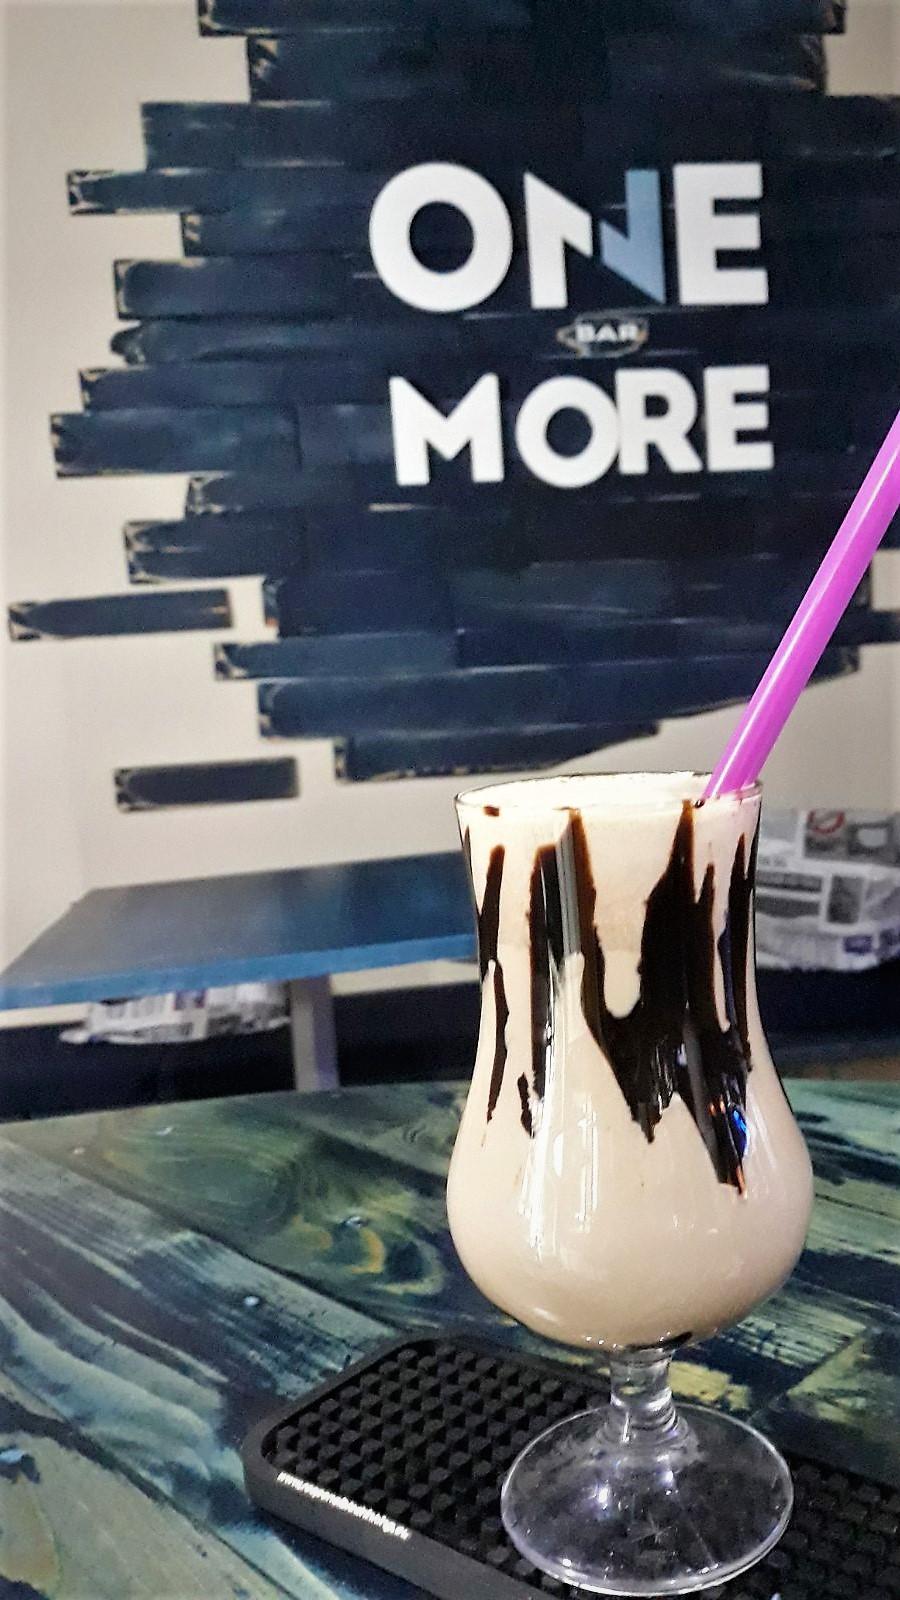 ice_caffe_sushi_bar_one_more